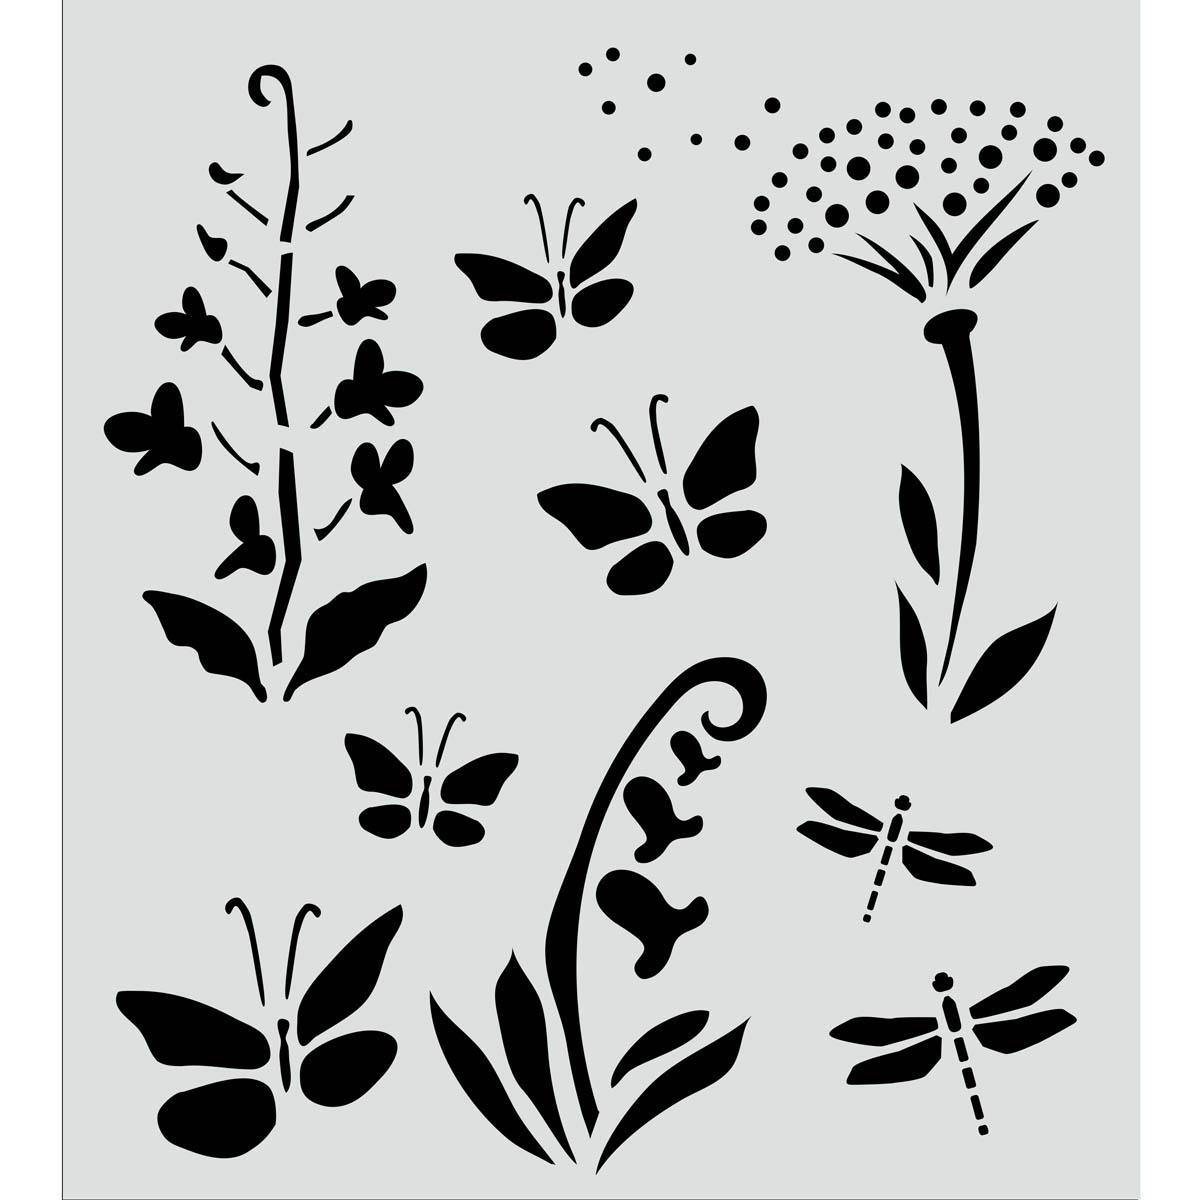 FolkArt ® Painting Stencils - Wildflowers & Butterflies - 30730